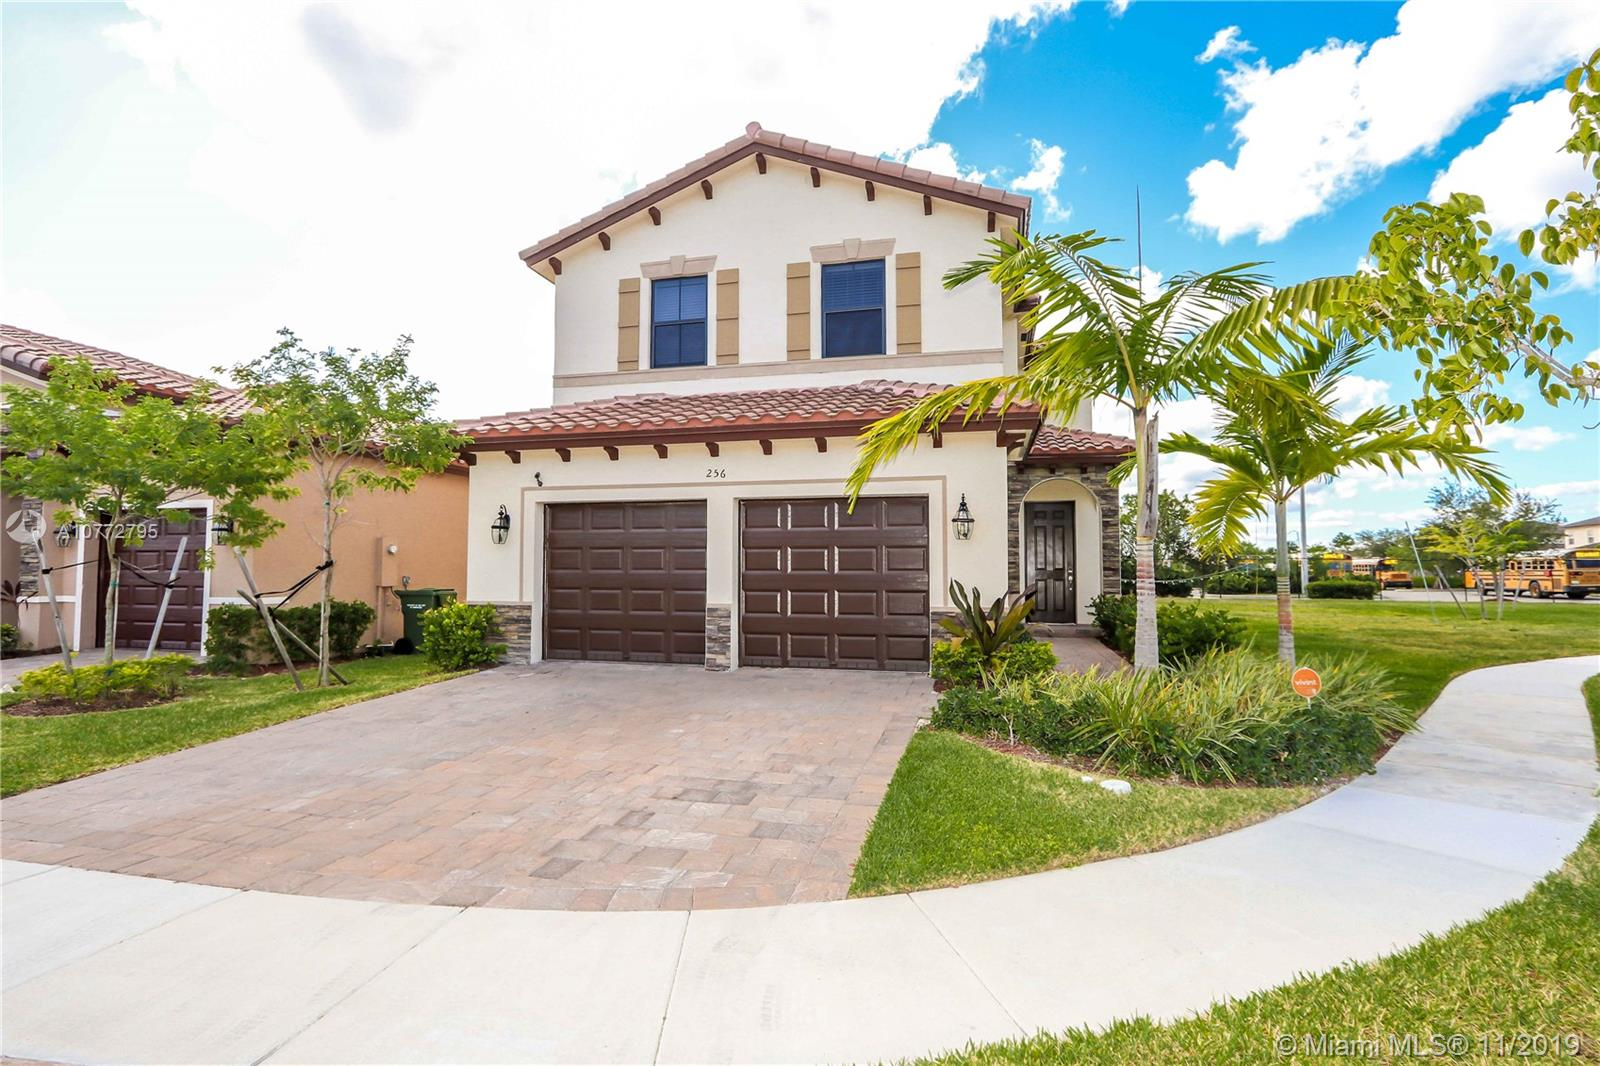 256 NE 23rd Ter, Homestead, FL 33033 - Homestead, FL real estate listing